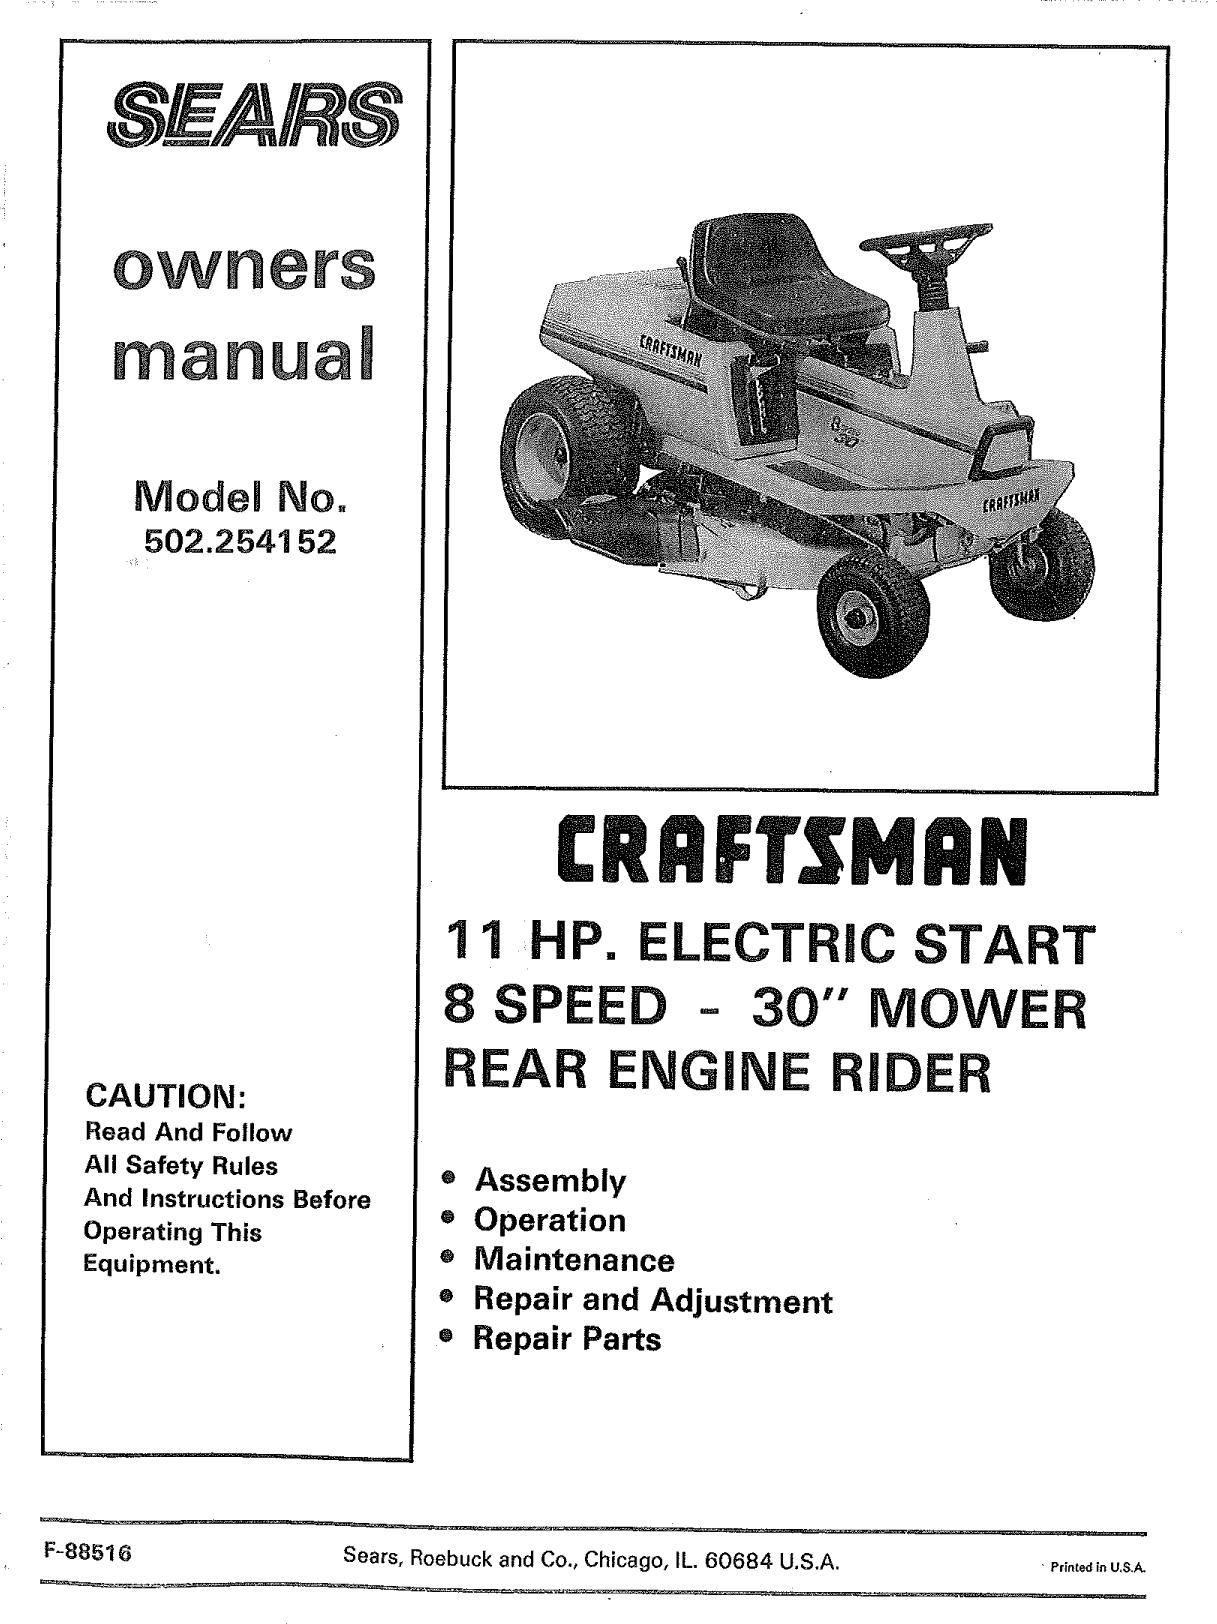 11 hp briggs carburetor diagram wiring schematic craftsman 502254152 user manual 11 hp rear engine rider manuals  user manual 11 hp rear engine